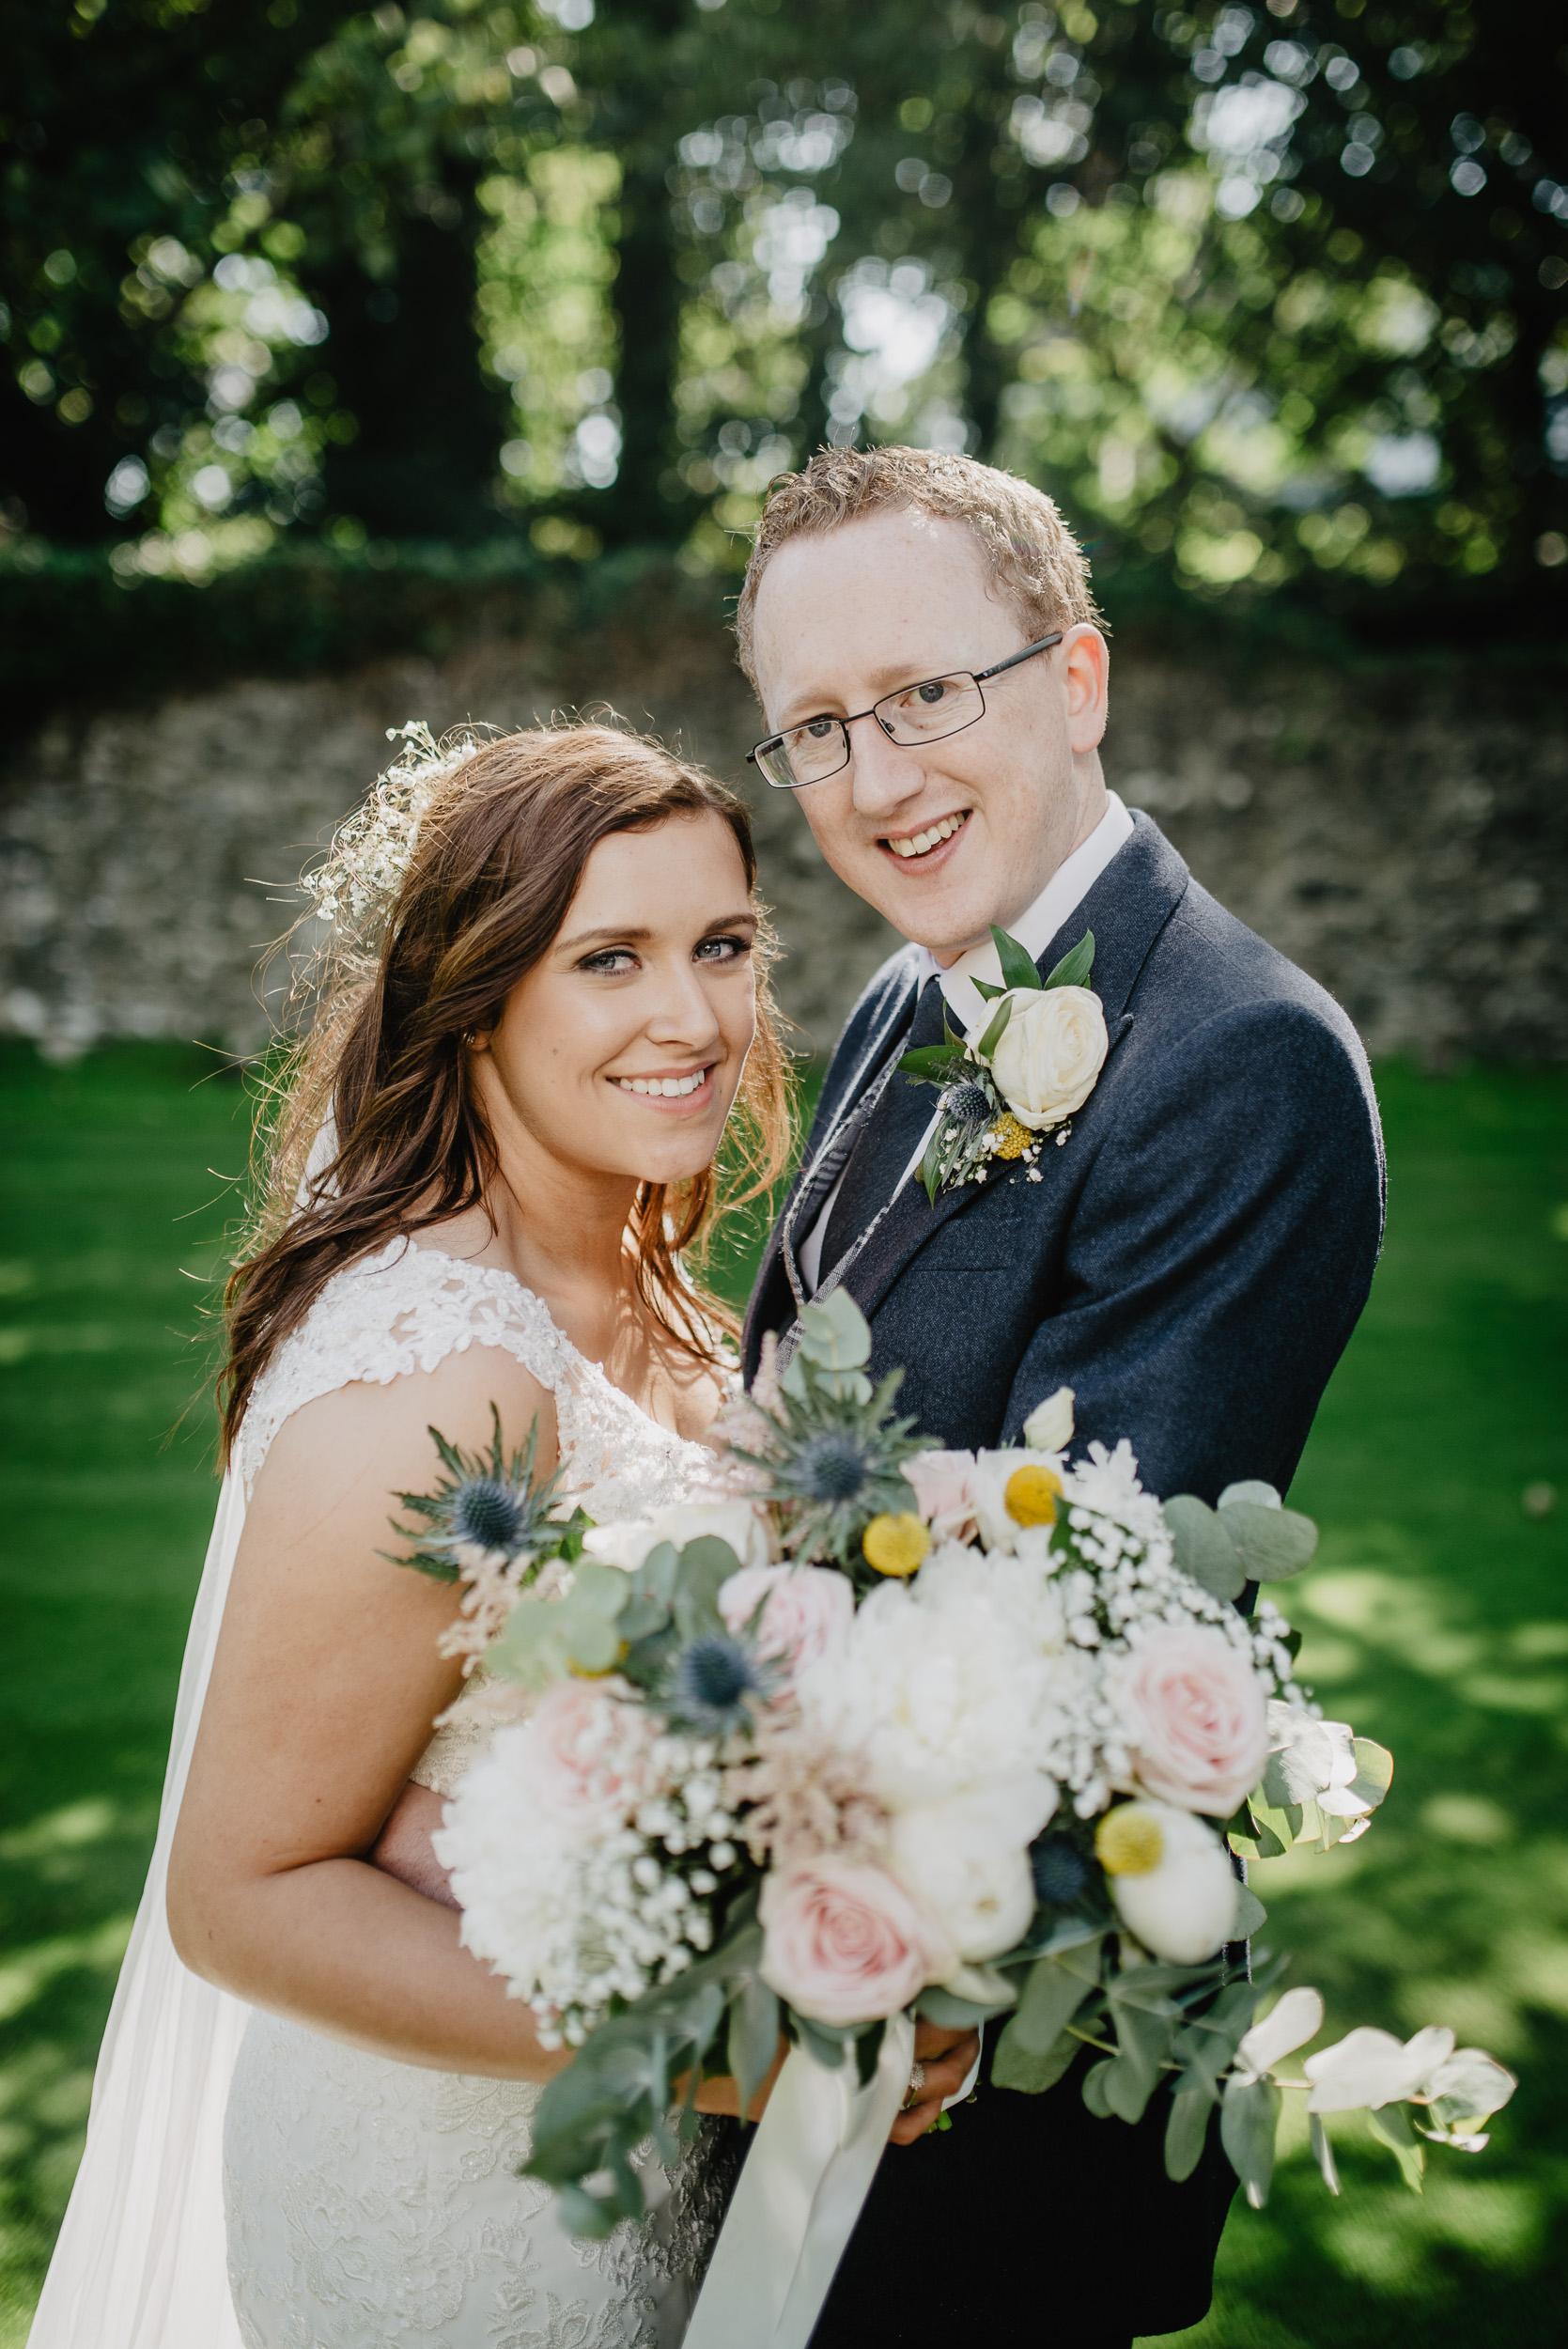 wedding photogaphy peter mackey 2018 beth-9.jpg